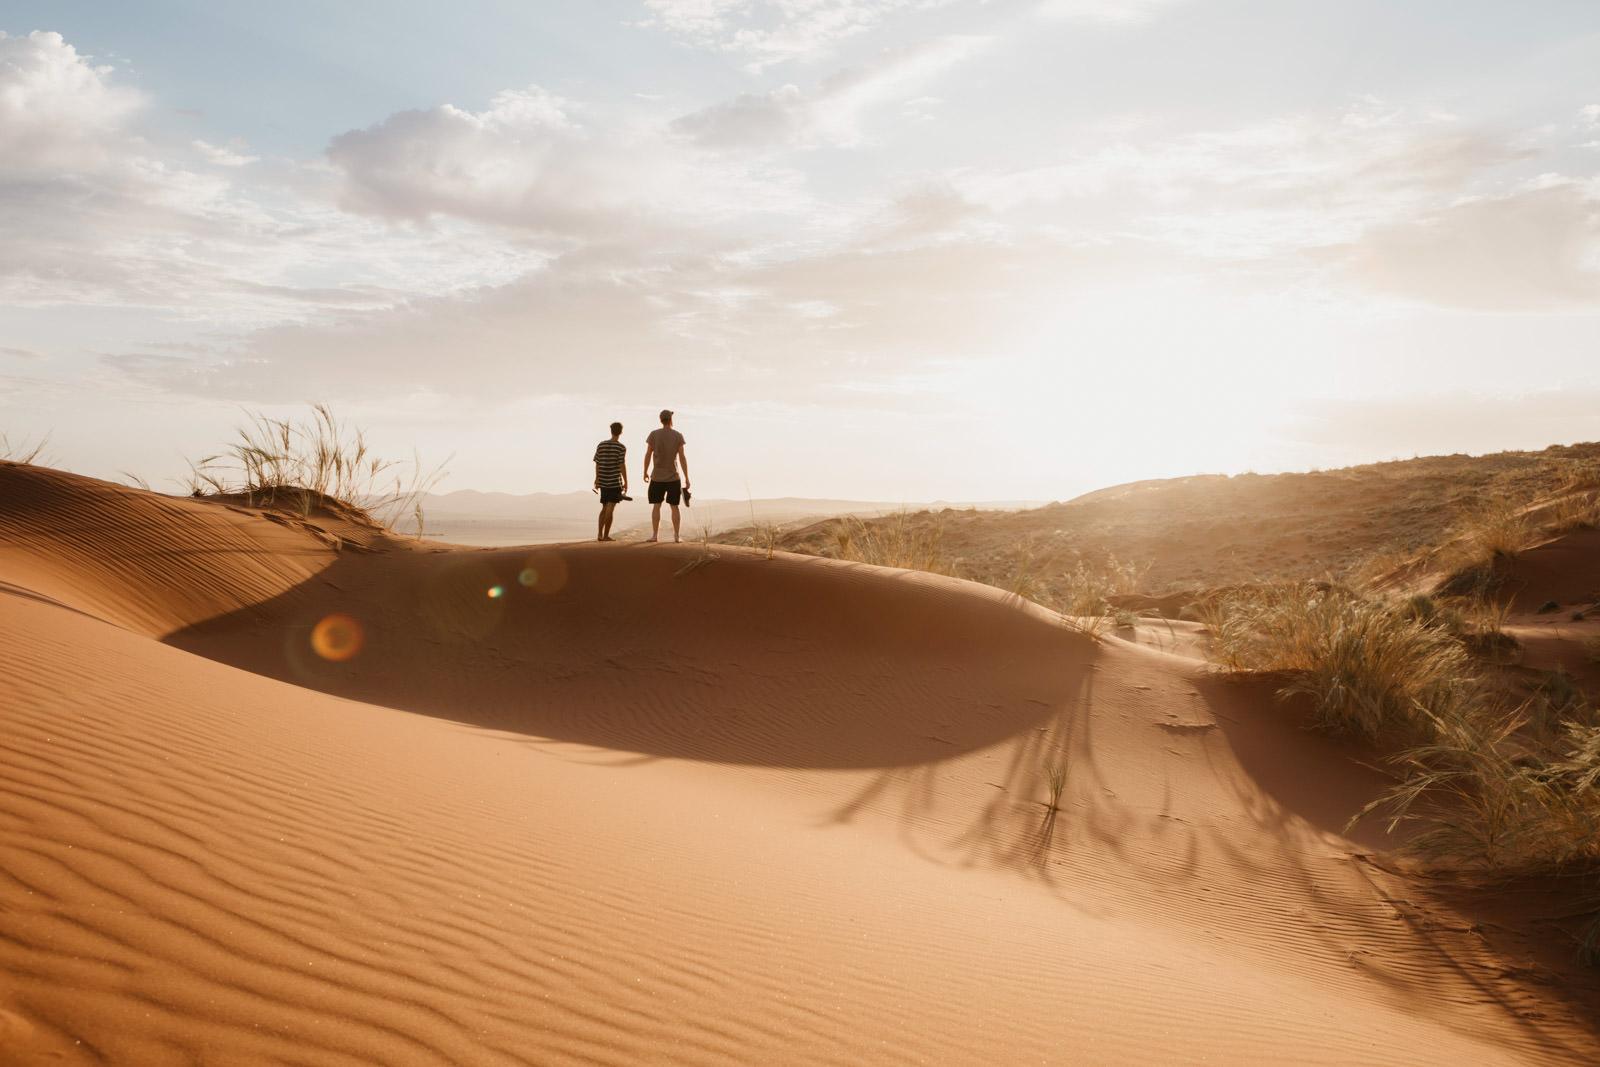 namibia_trip_rooftent_camping_roadtrip (24 von 26).jpg